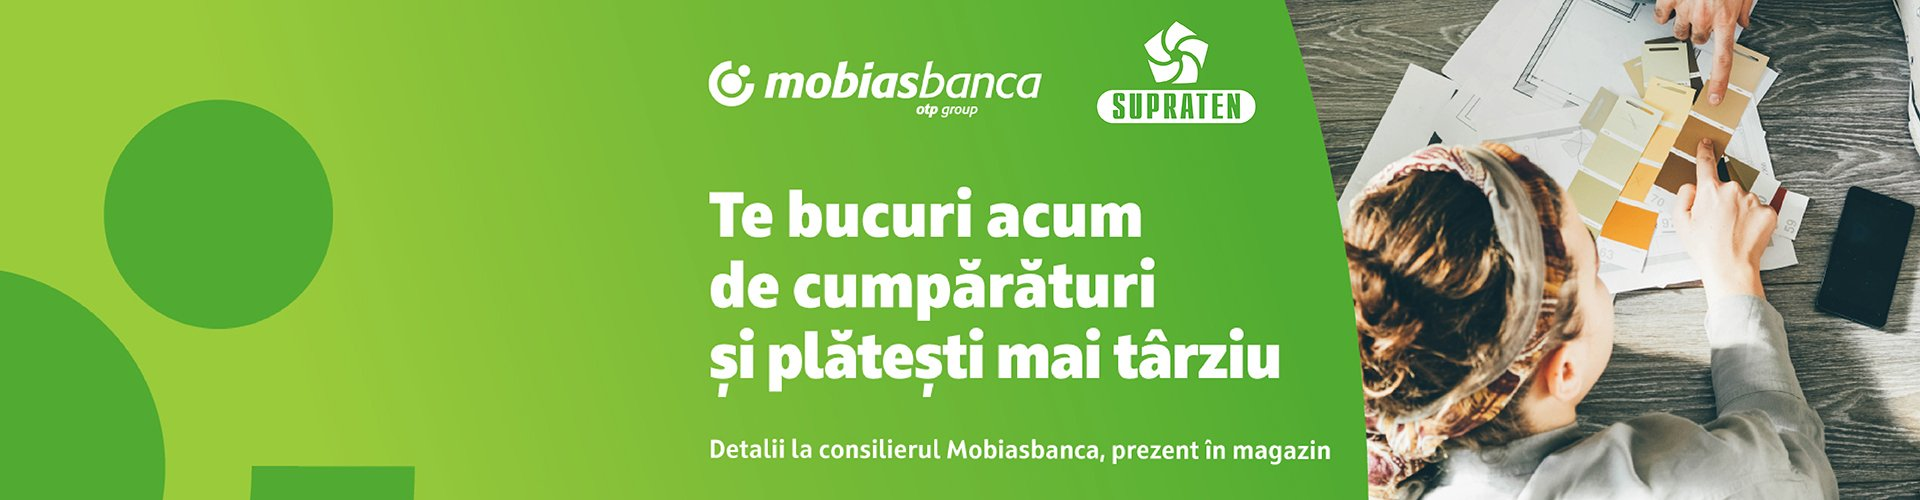 Mobiasbanca